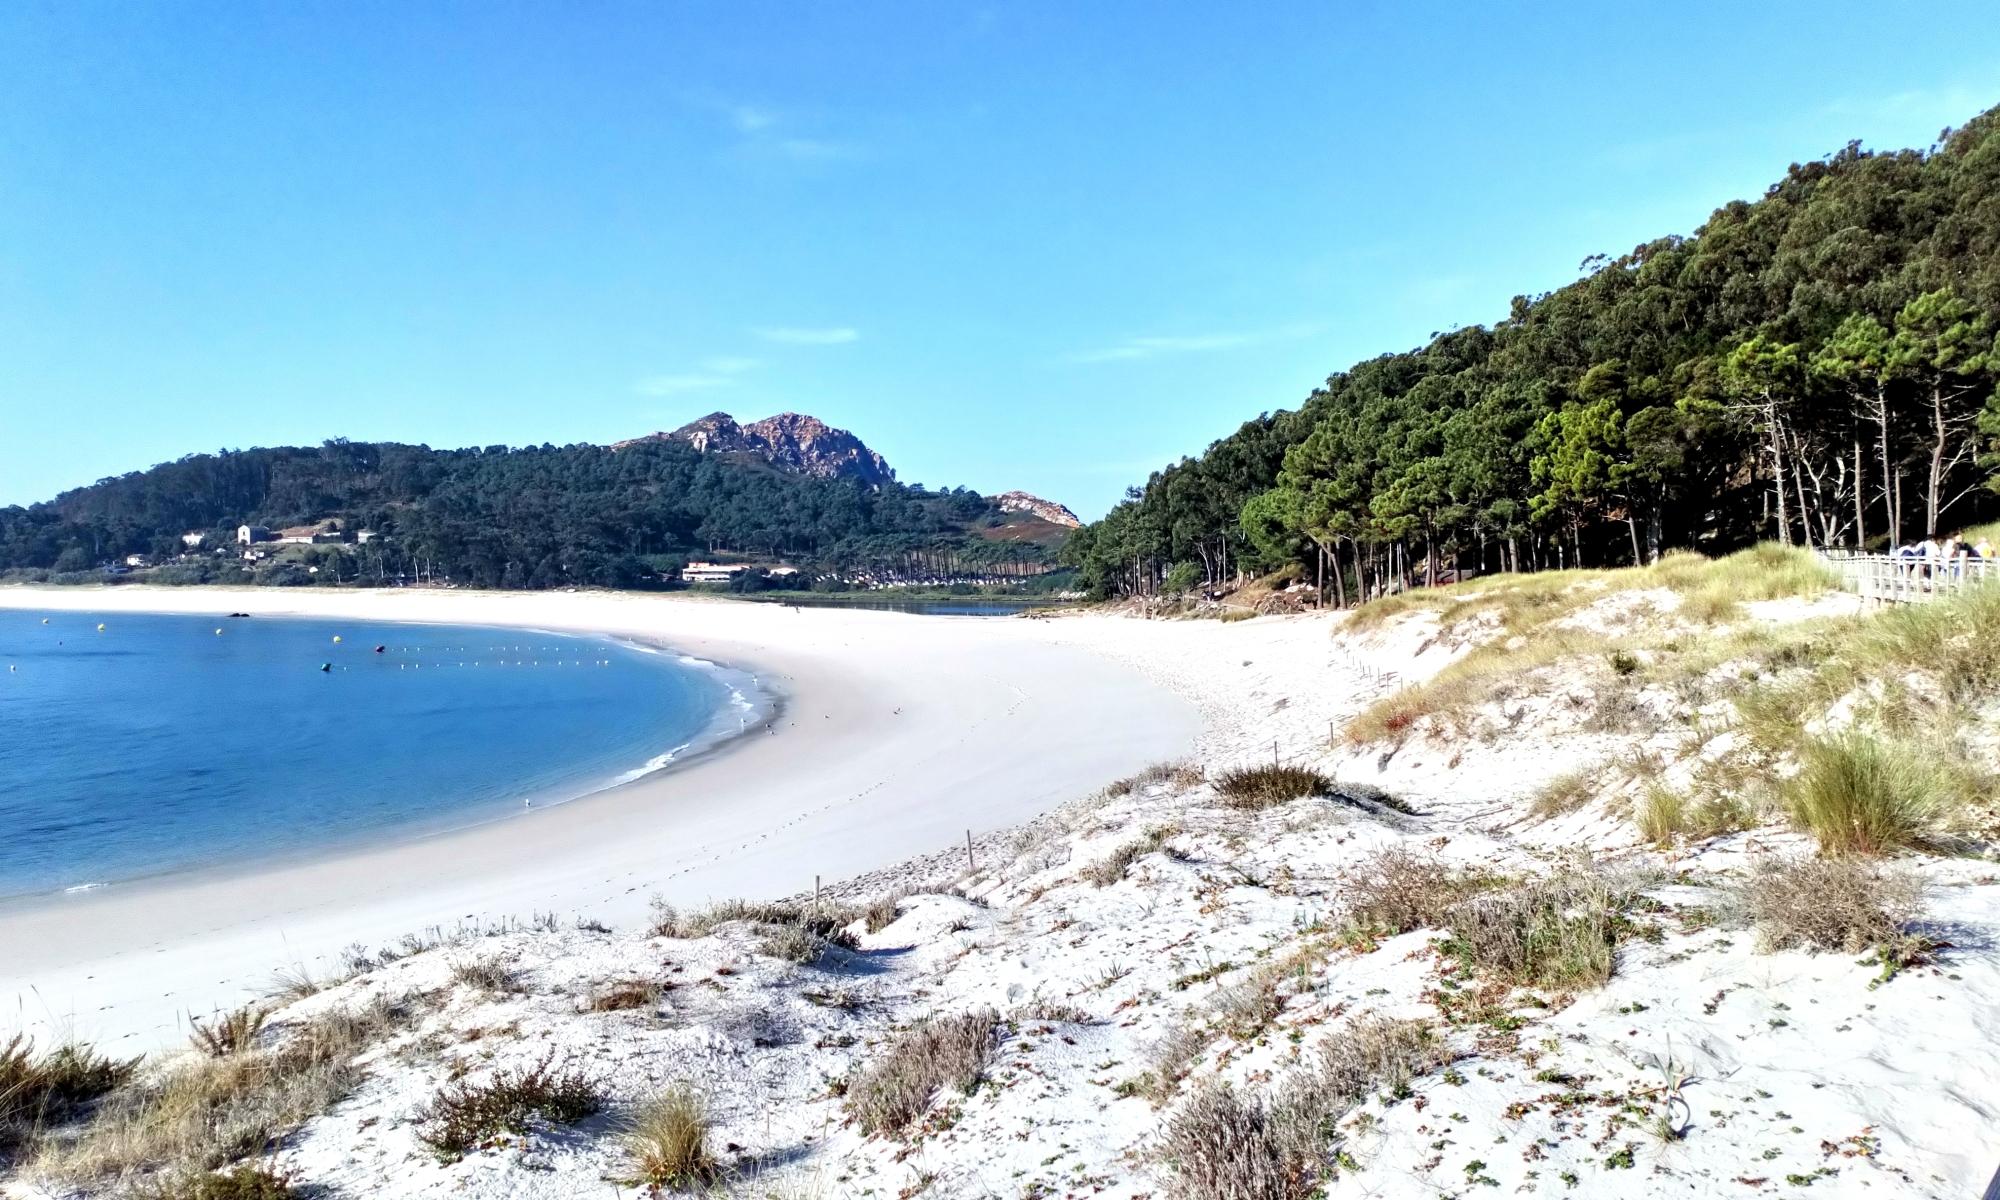 Beach with brambles